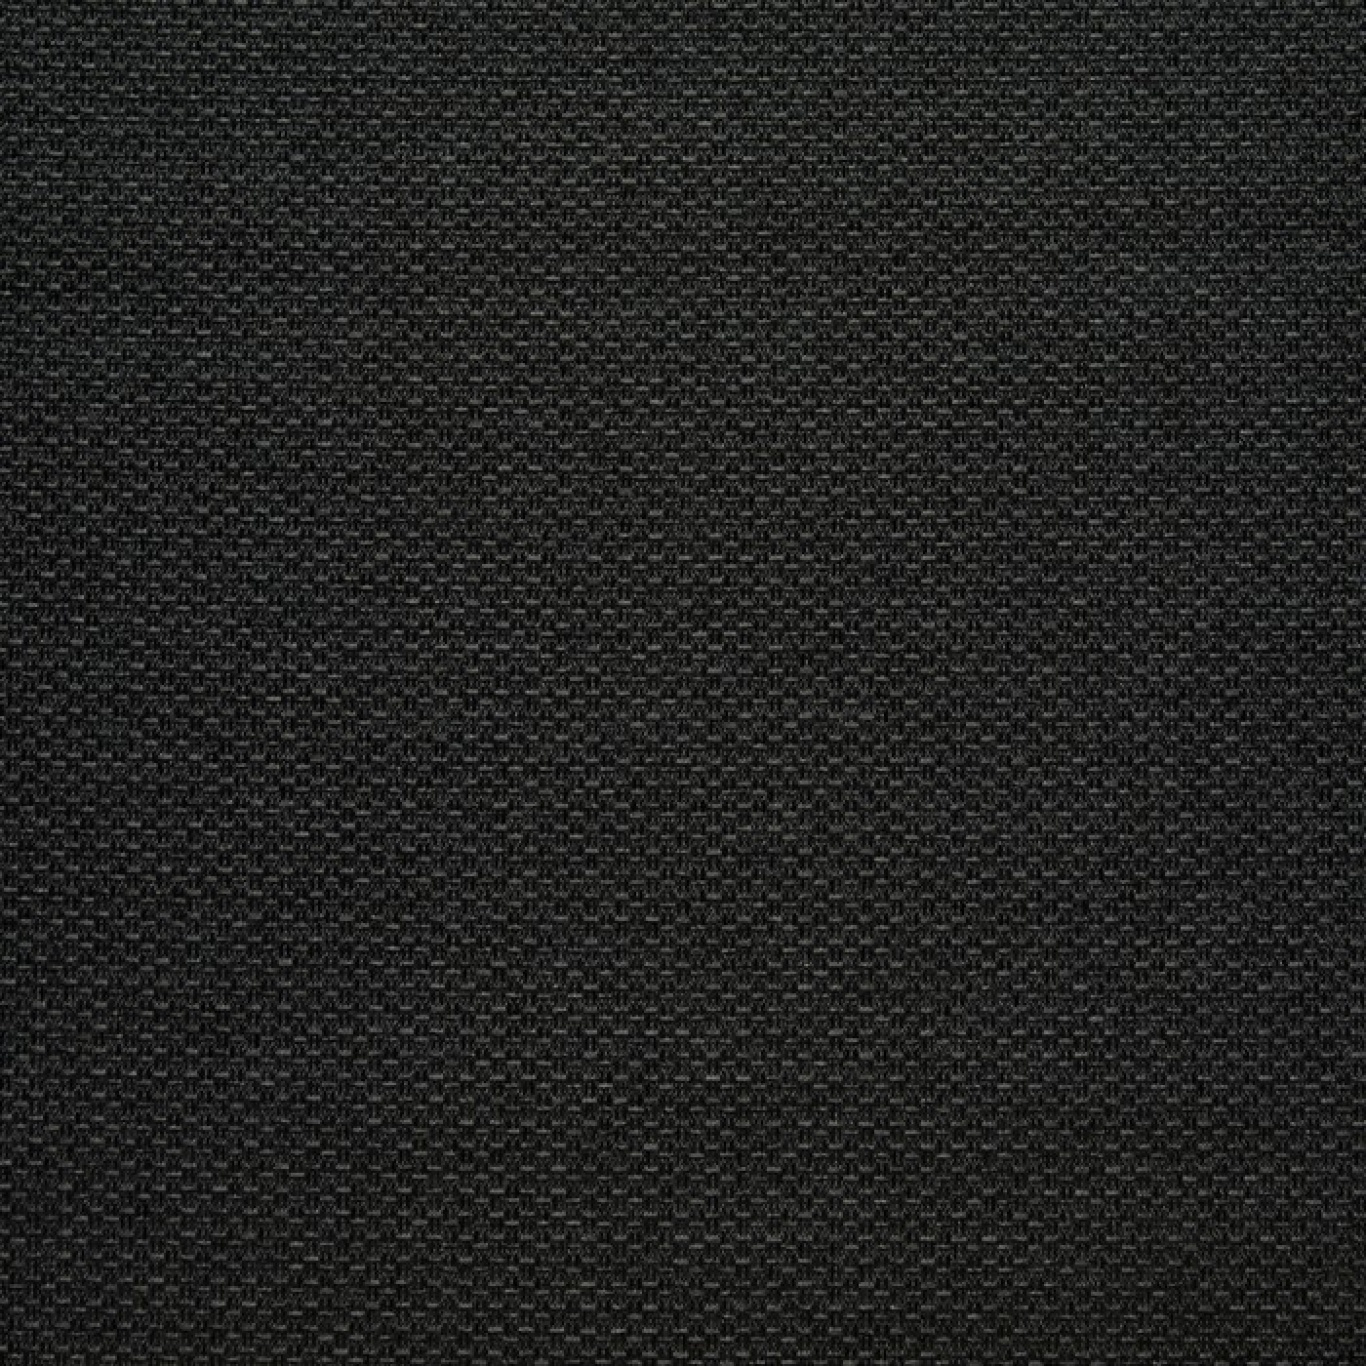 Image of Prestigious Chiltern Raven FR Fabric 2009/915